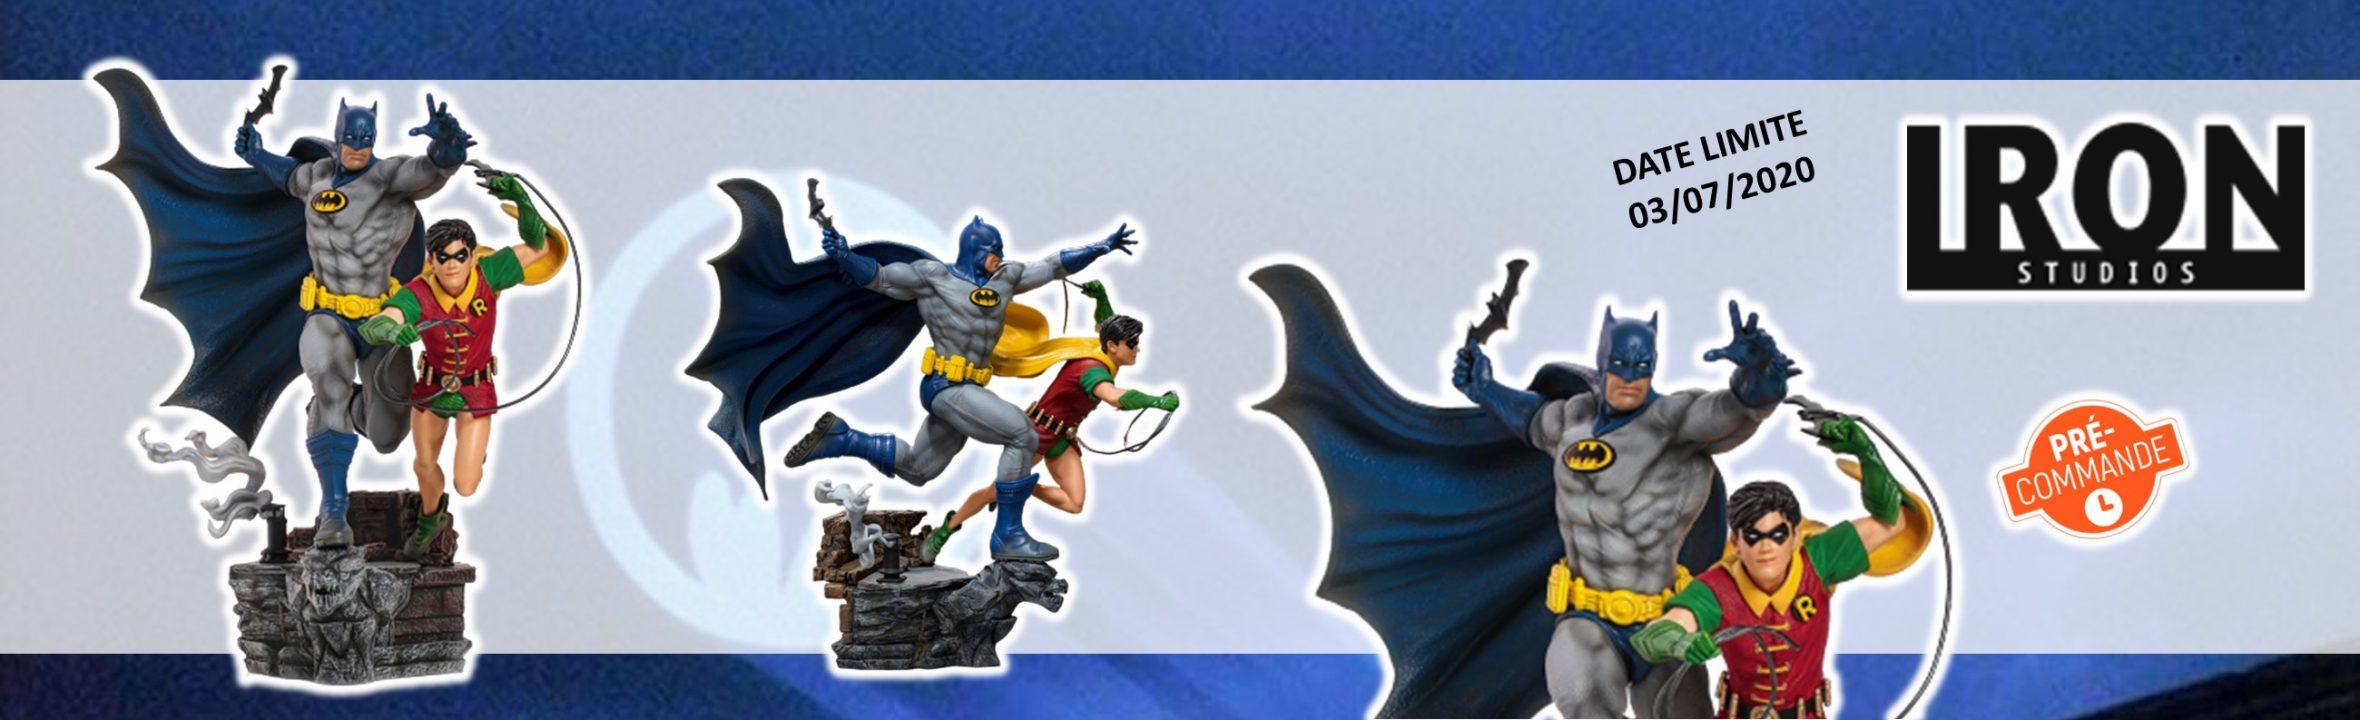 preco batman & robin iron studios artscale 25cm goodin shop